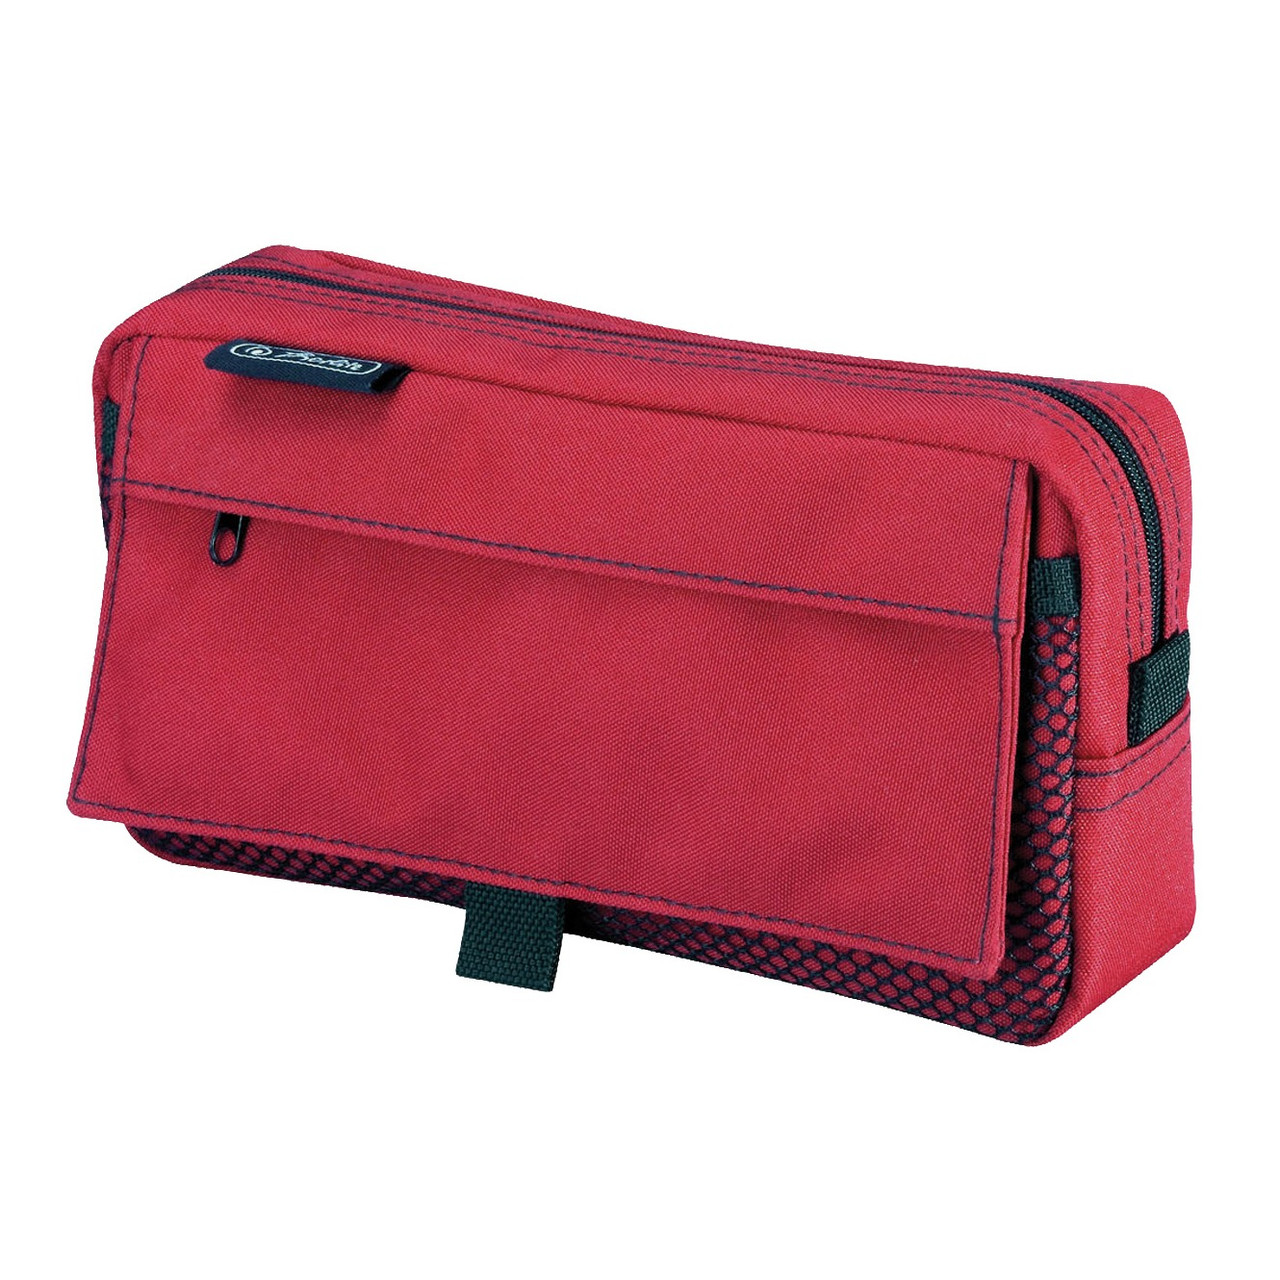 Пенал Herlitz Pockets Red (11415940)